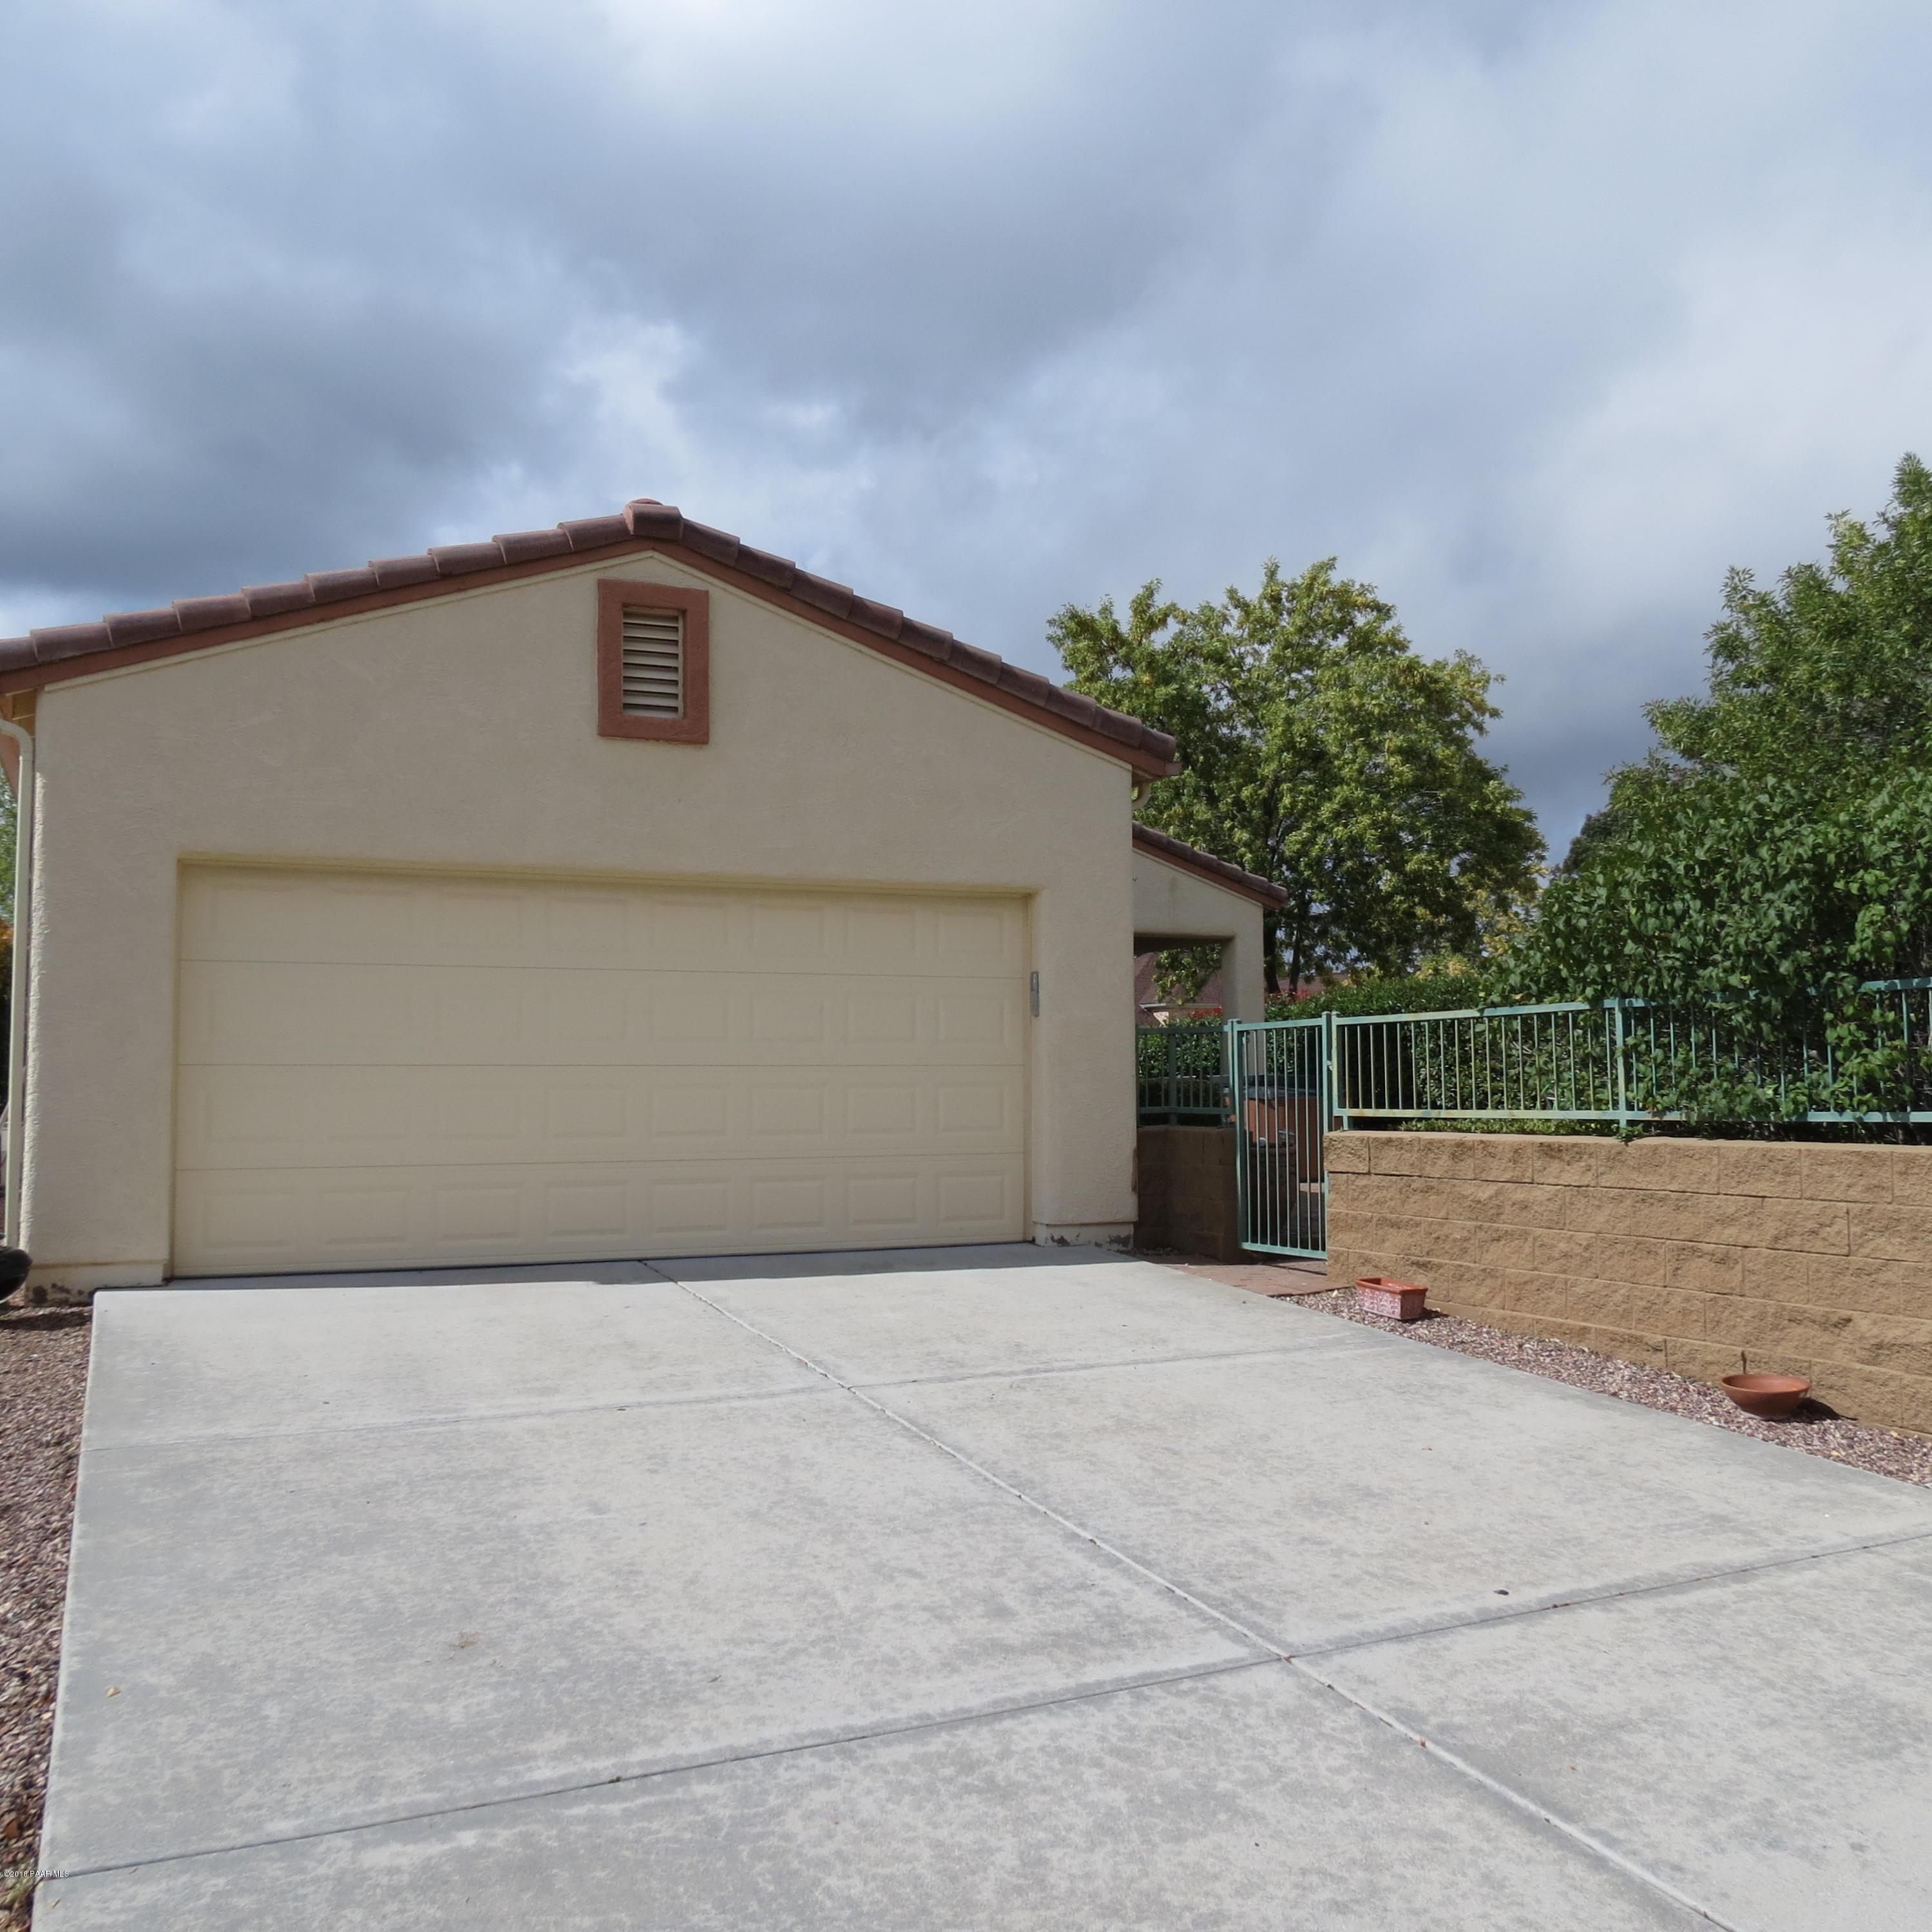 7098 E Encampment Drive Prescott Valley, AZ 86314 - MLS #: 1016117